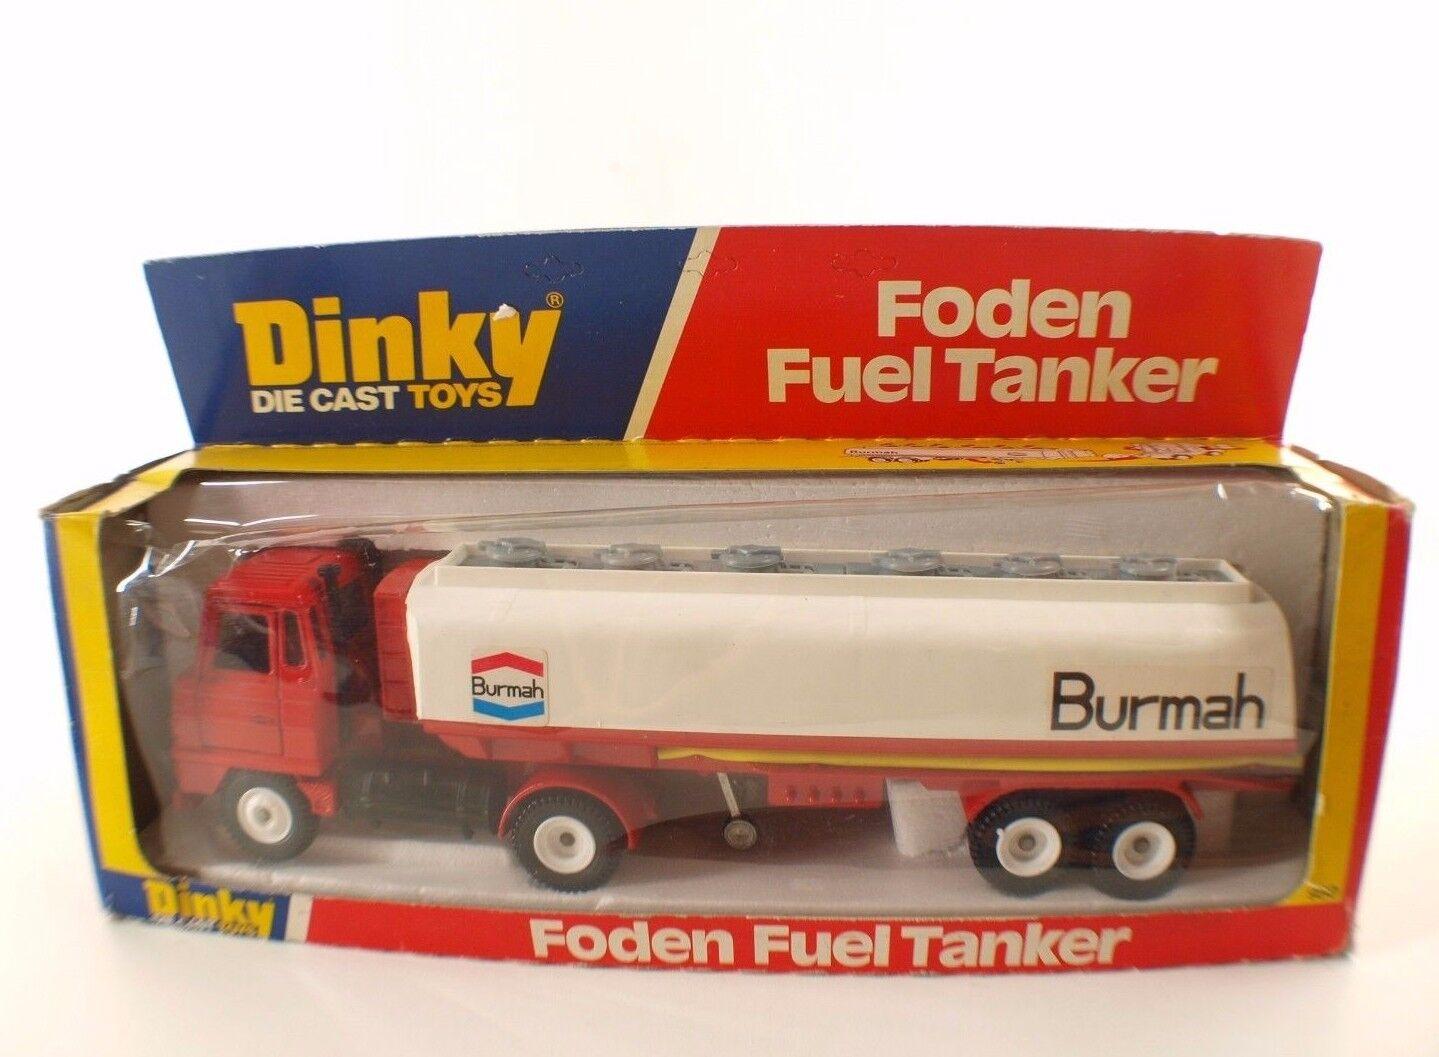 Dinky Juguetes GB n° 950 FODEN Semi-remorque citerne BURMAH camion tanker en boite